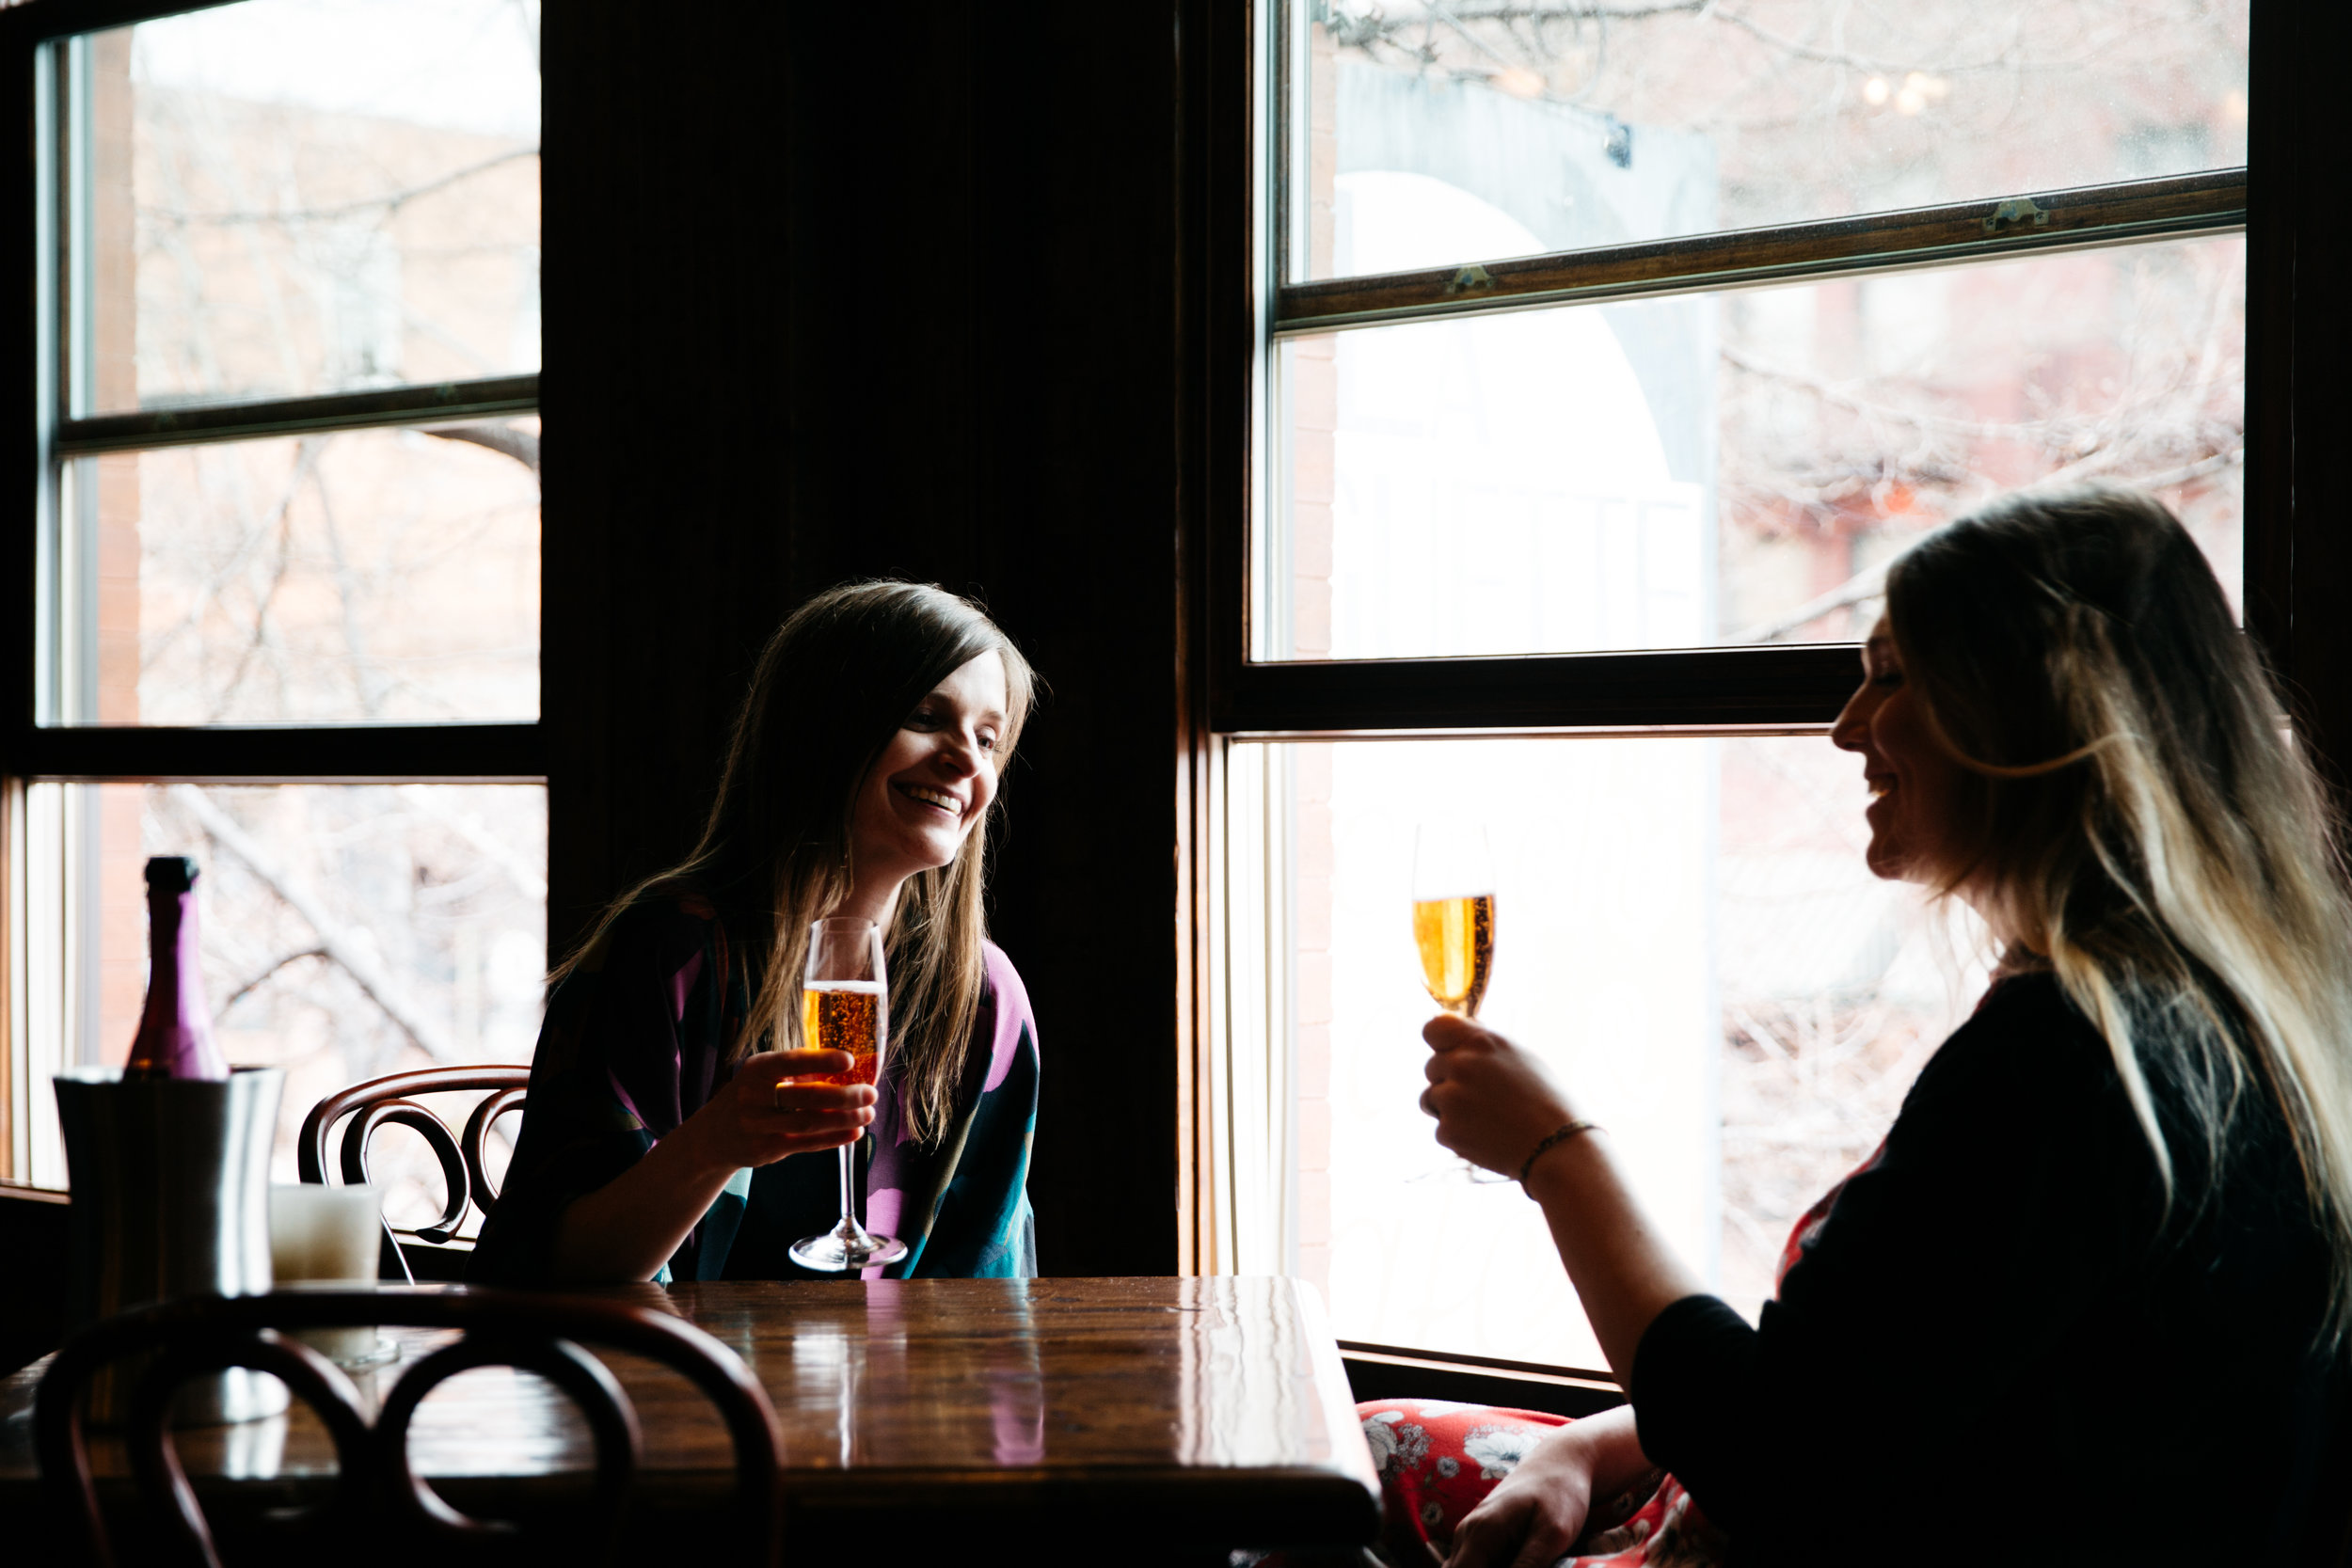 tlb-upstairs-wine-bar-occ-elan-photographie-studio-103.jpg